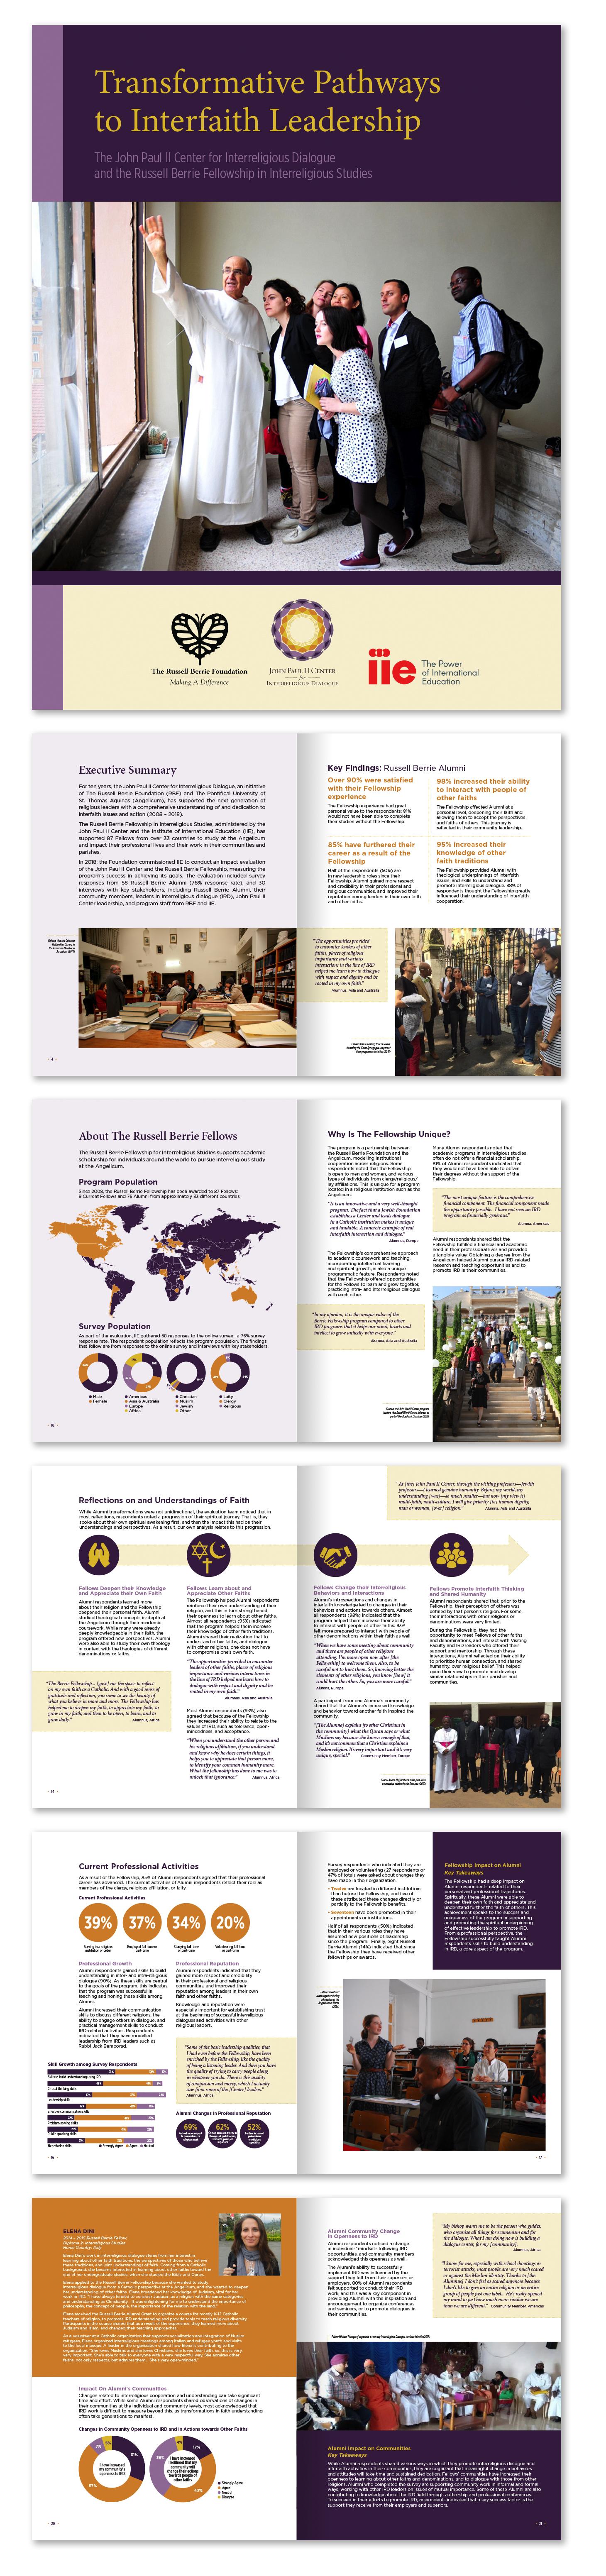 IIE Transformative Pathways Report.jpg